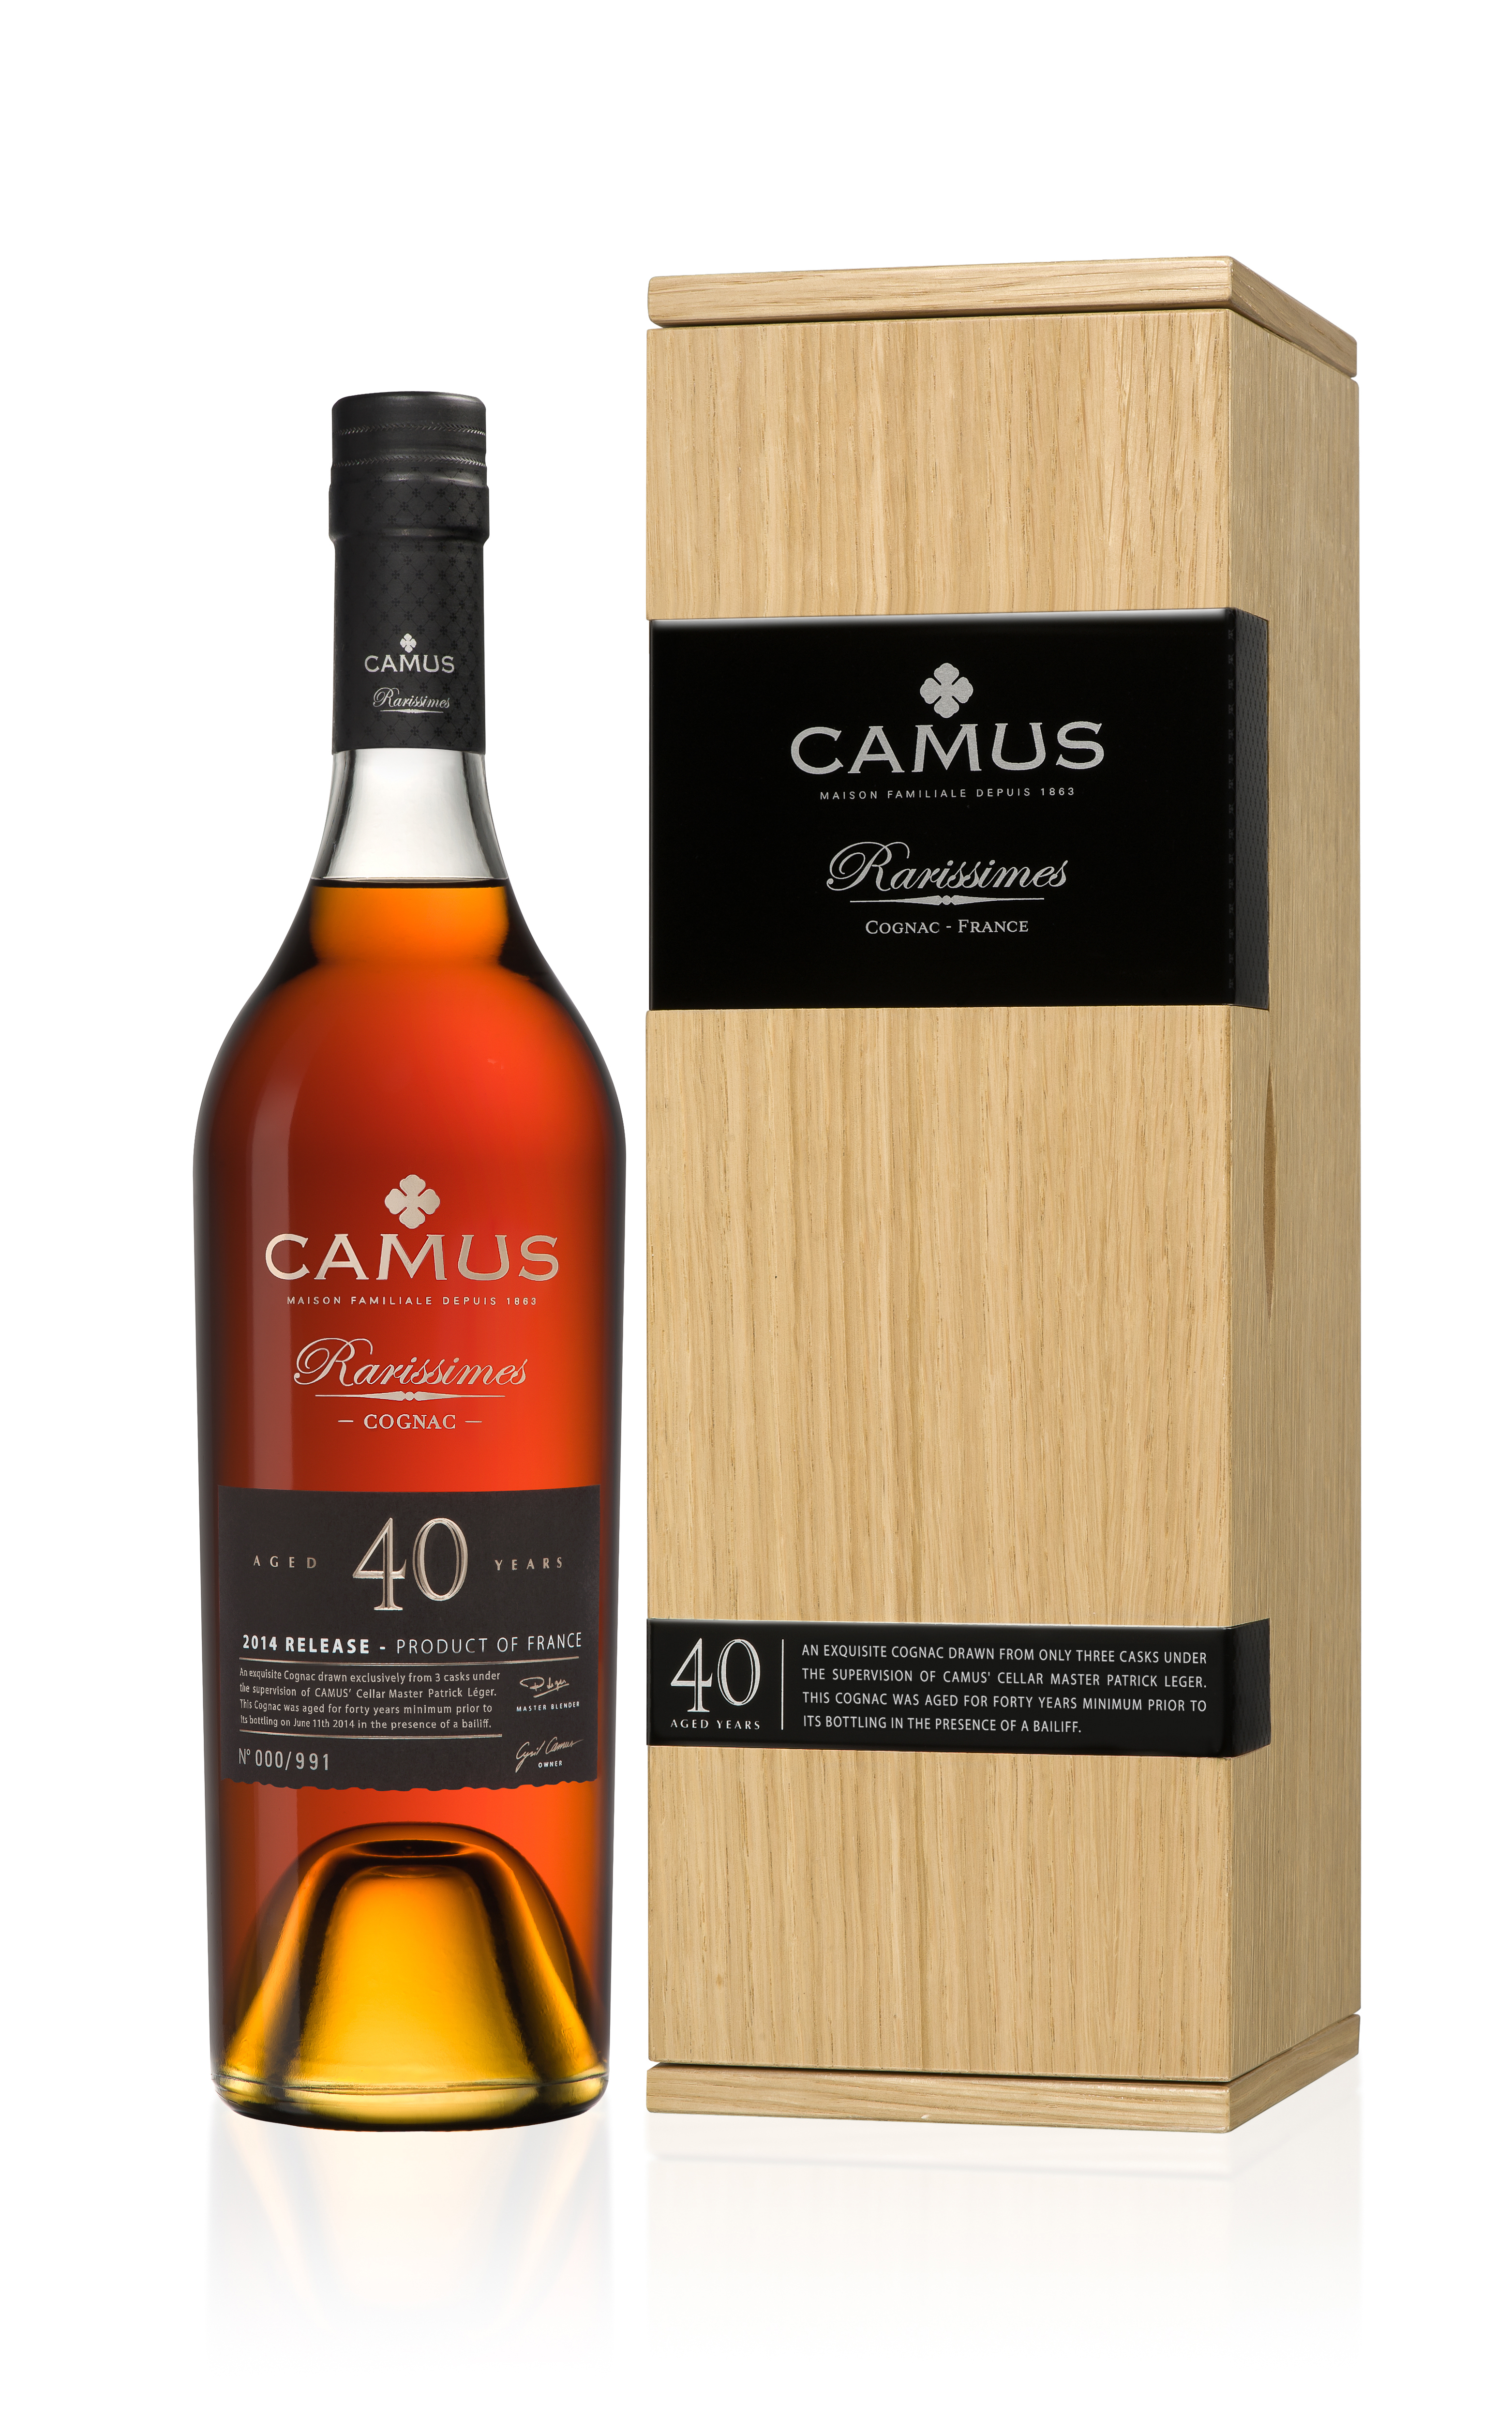 New Product: Camus Rarissimes 40 Year Old Ltd Ed Cognac